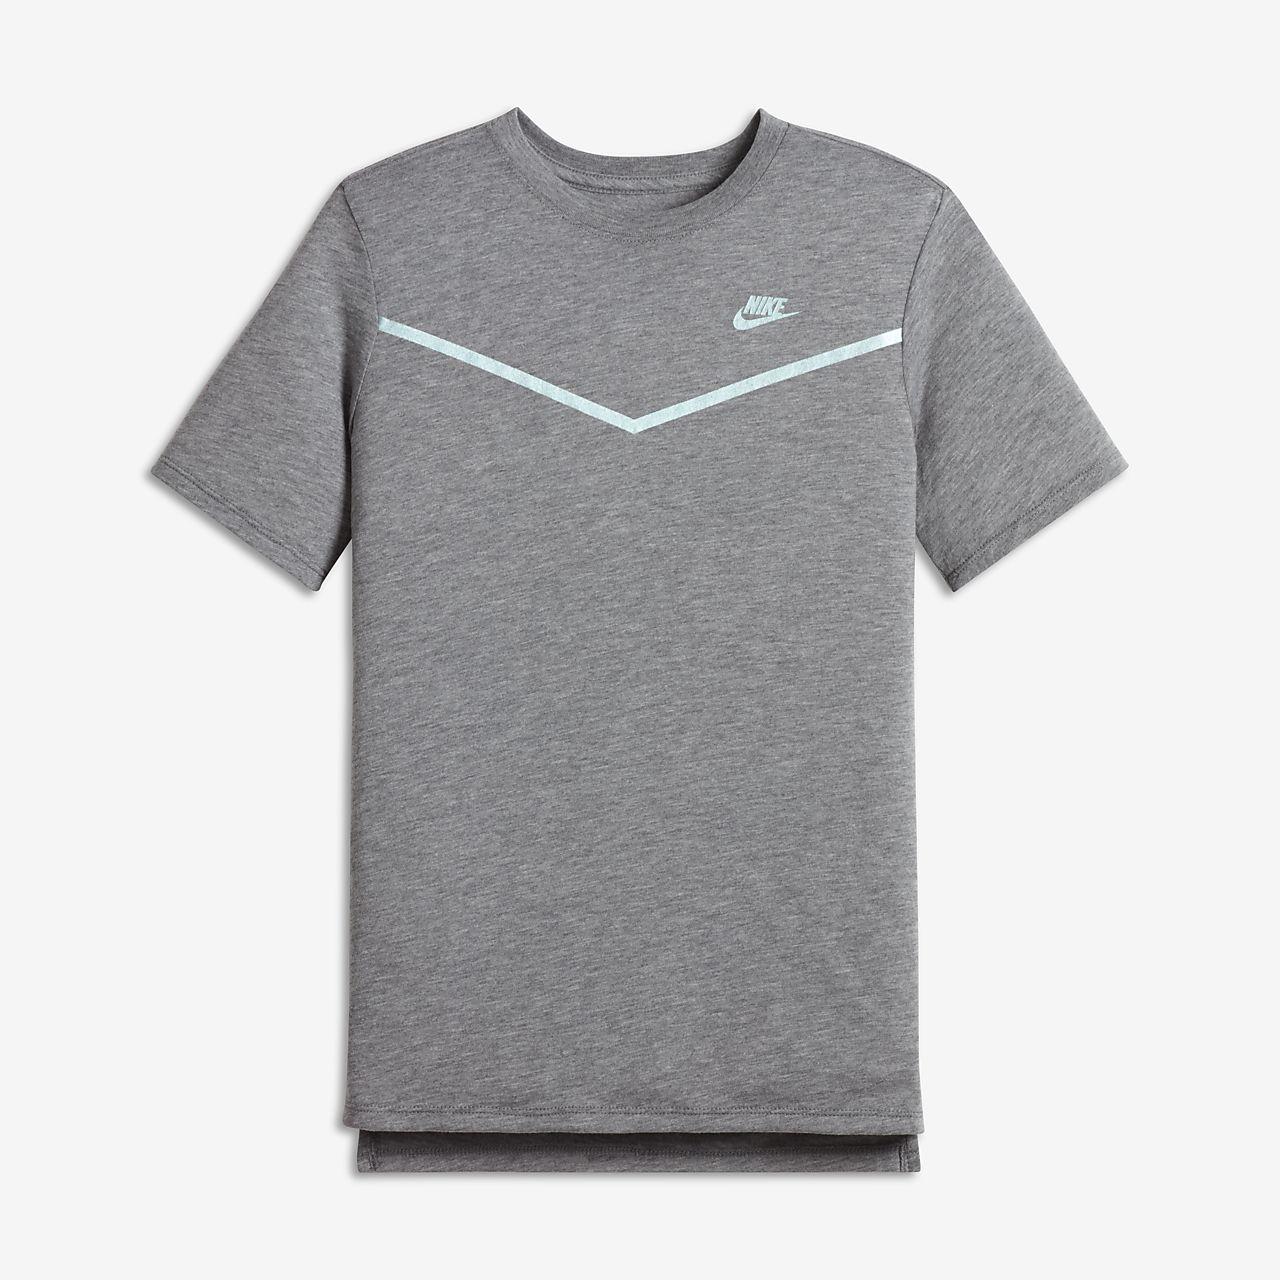 Nike Sportswear Tech Big Kids' T-Shirts Carbon Heather/Black